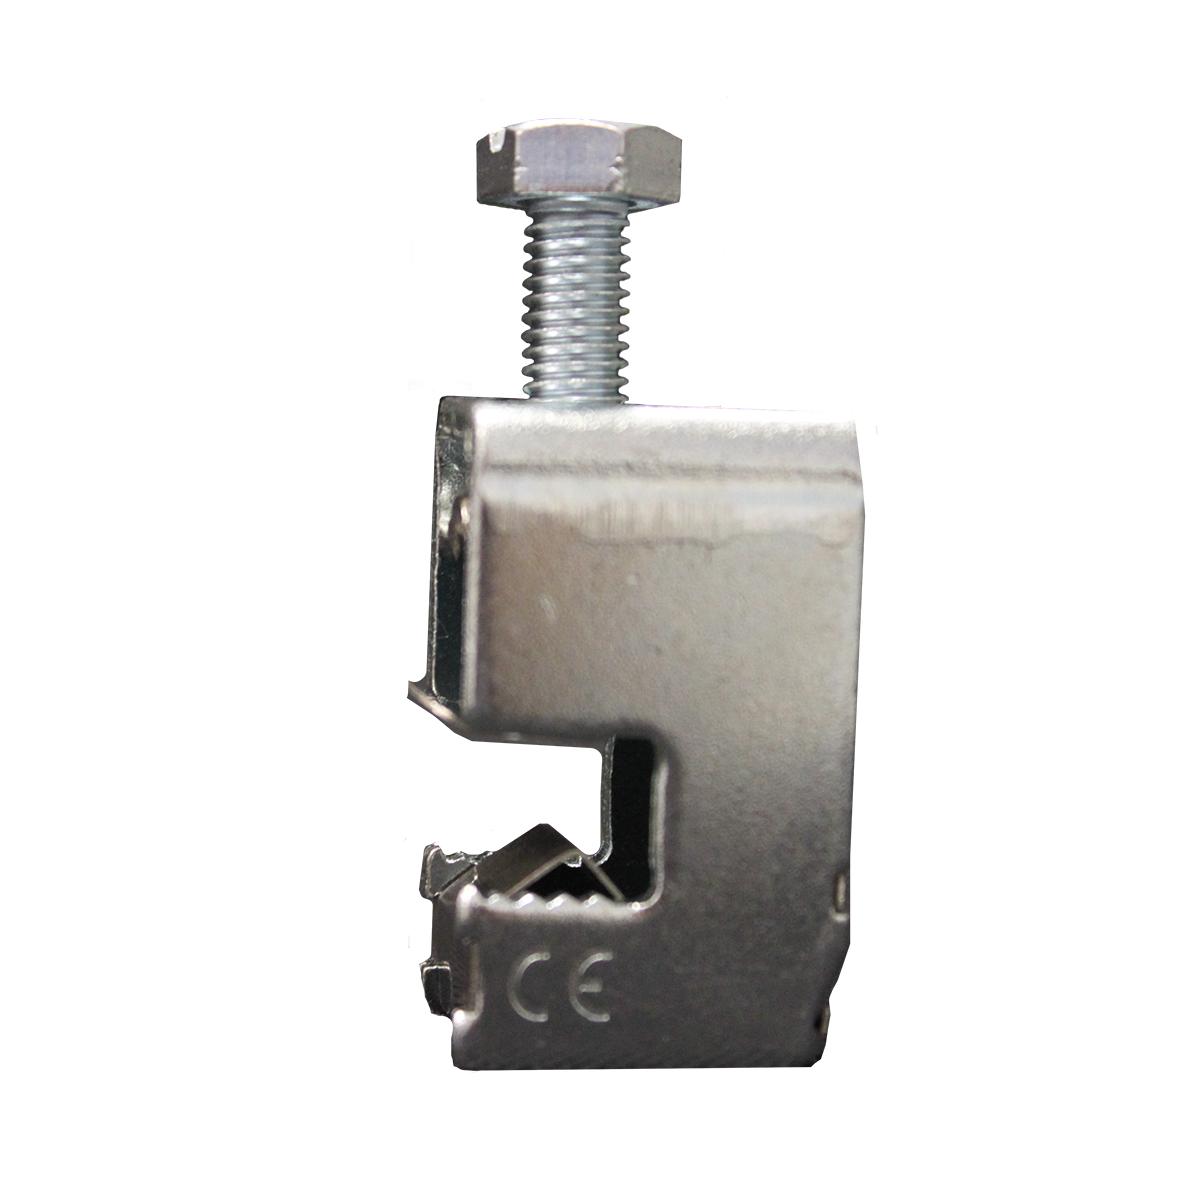 1 Stk Alu-Kupfer-Leiteranschlußklemme 1,5 -16mm² / 5mm² IS5051605-